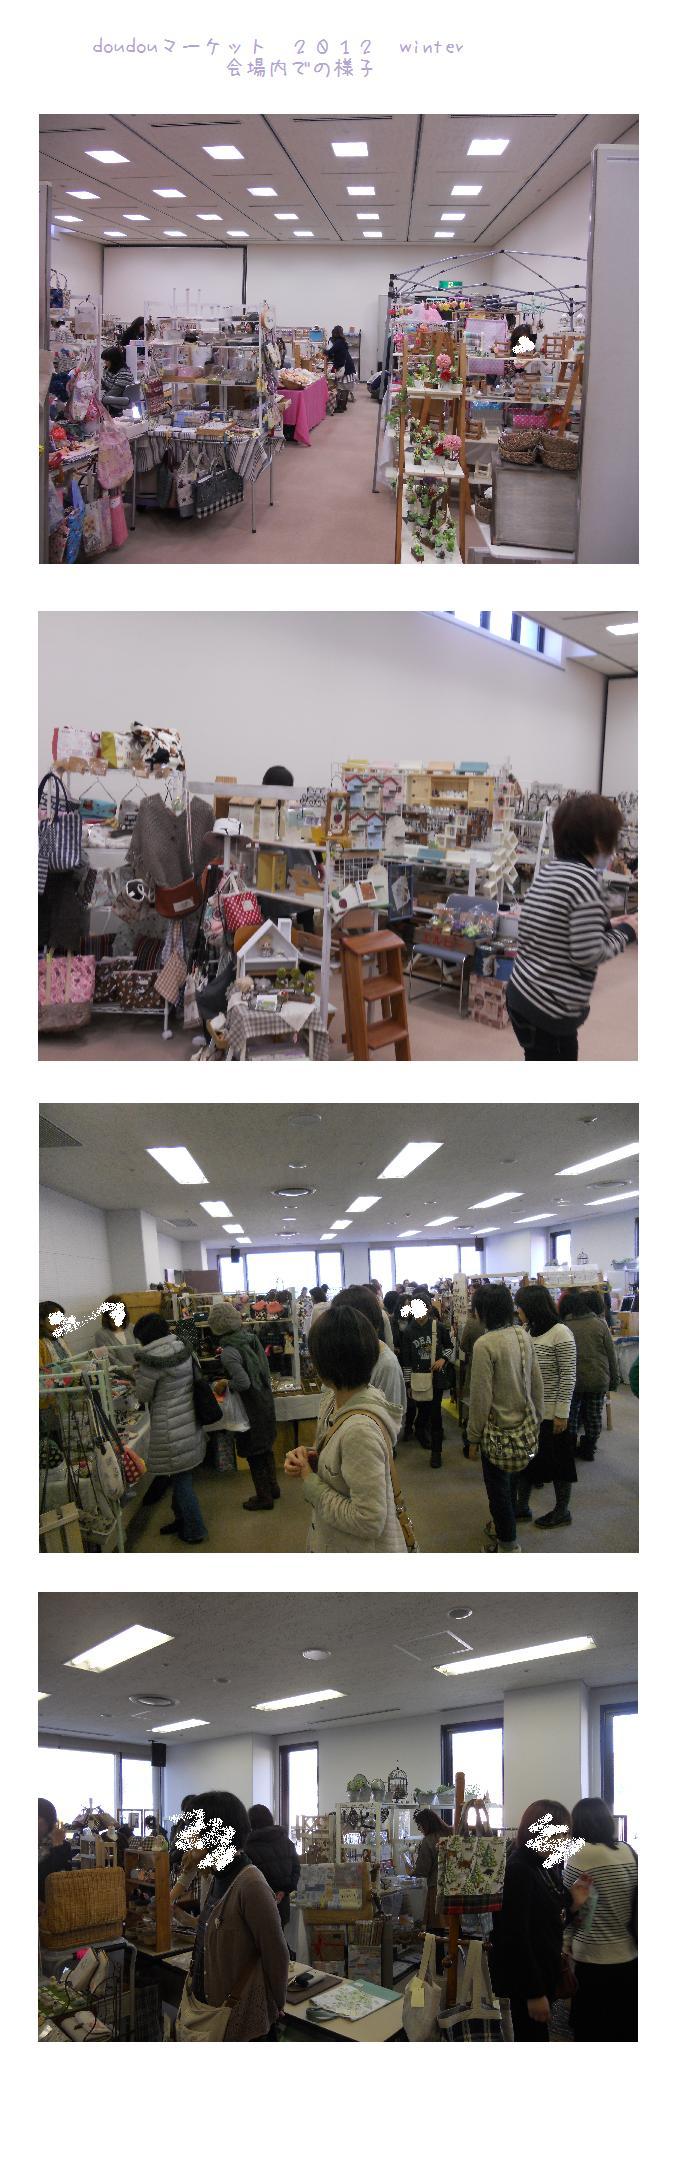 doudouマーケット2012 winter.jpg